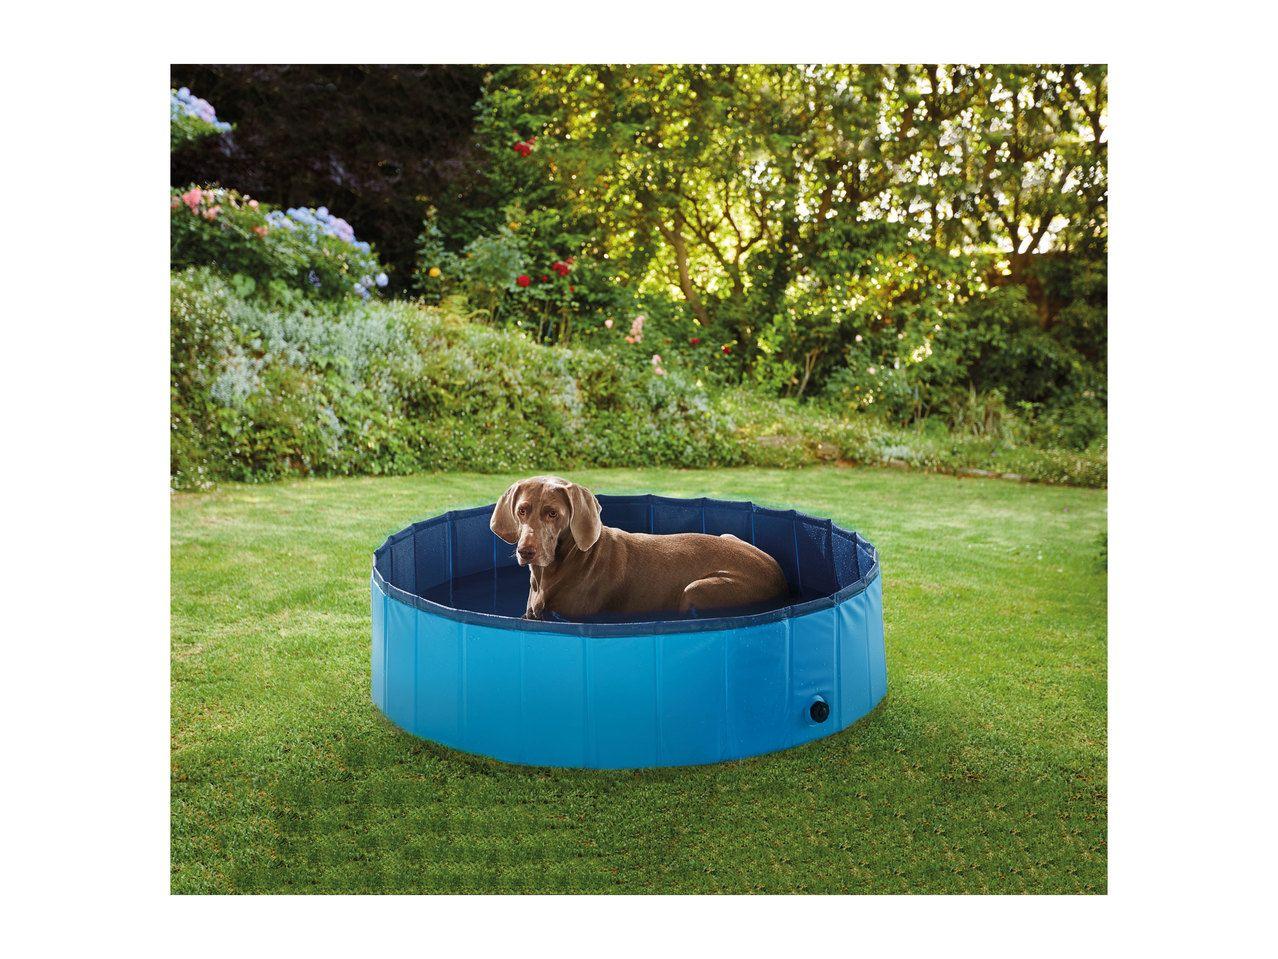 zoofari dog bed with shade